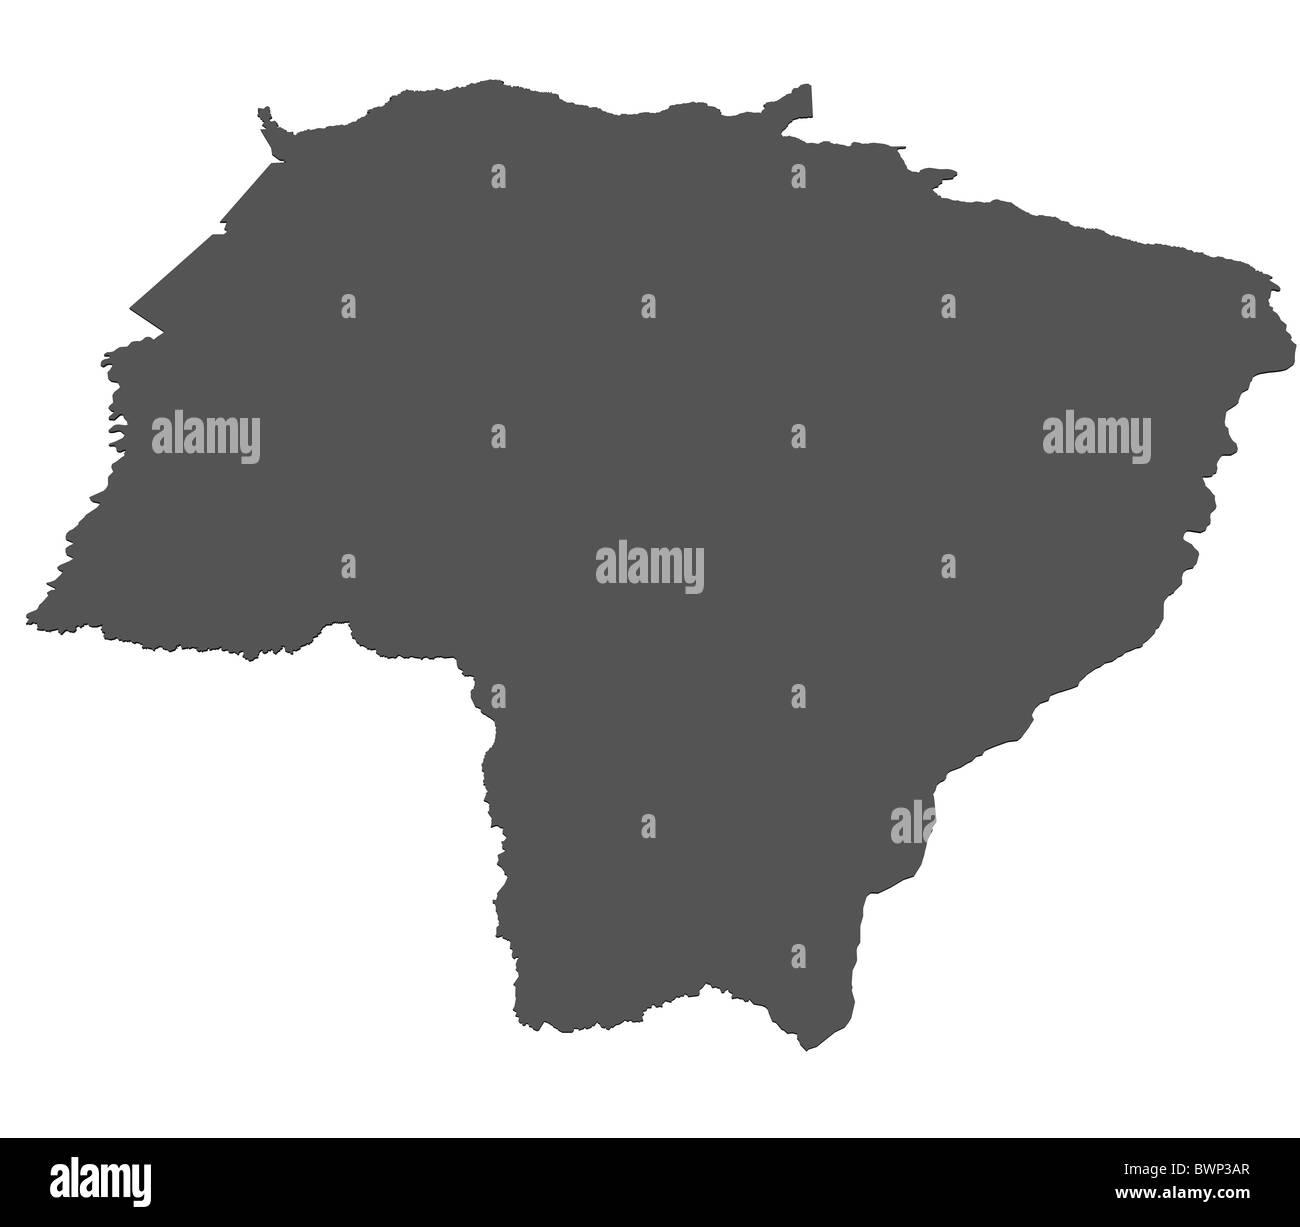 Isolated map of Mato Grosso Do Sul - Brazil Stock Photo